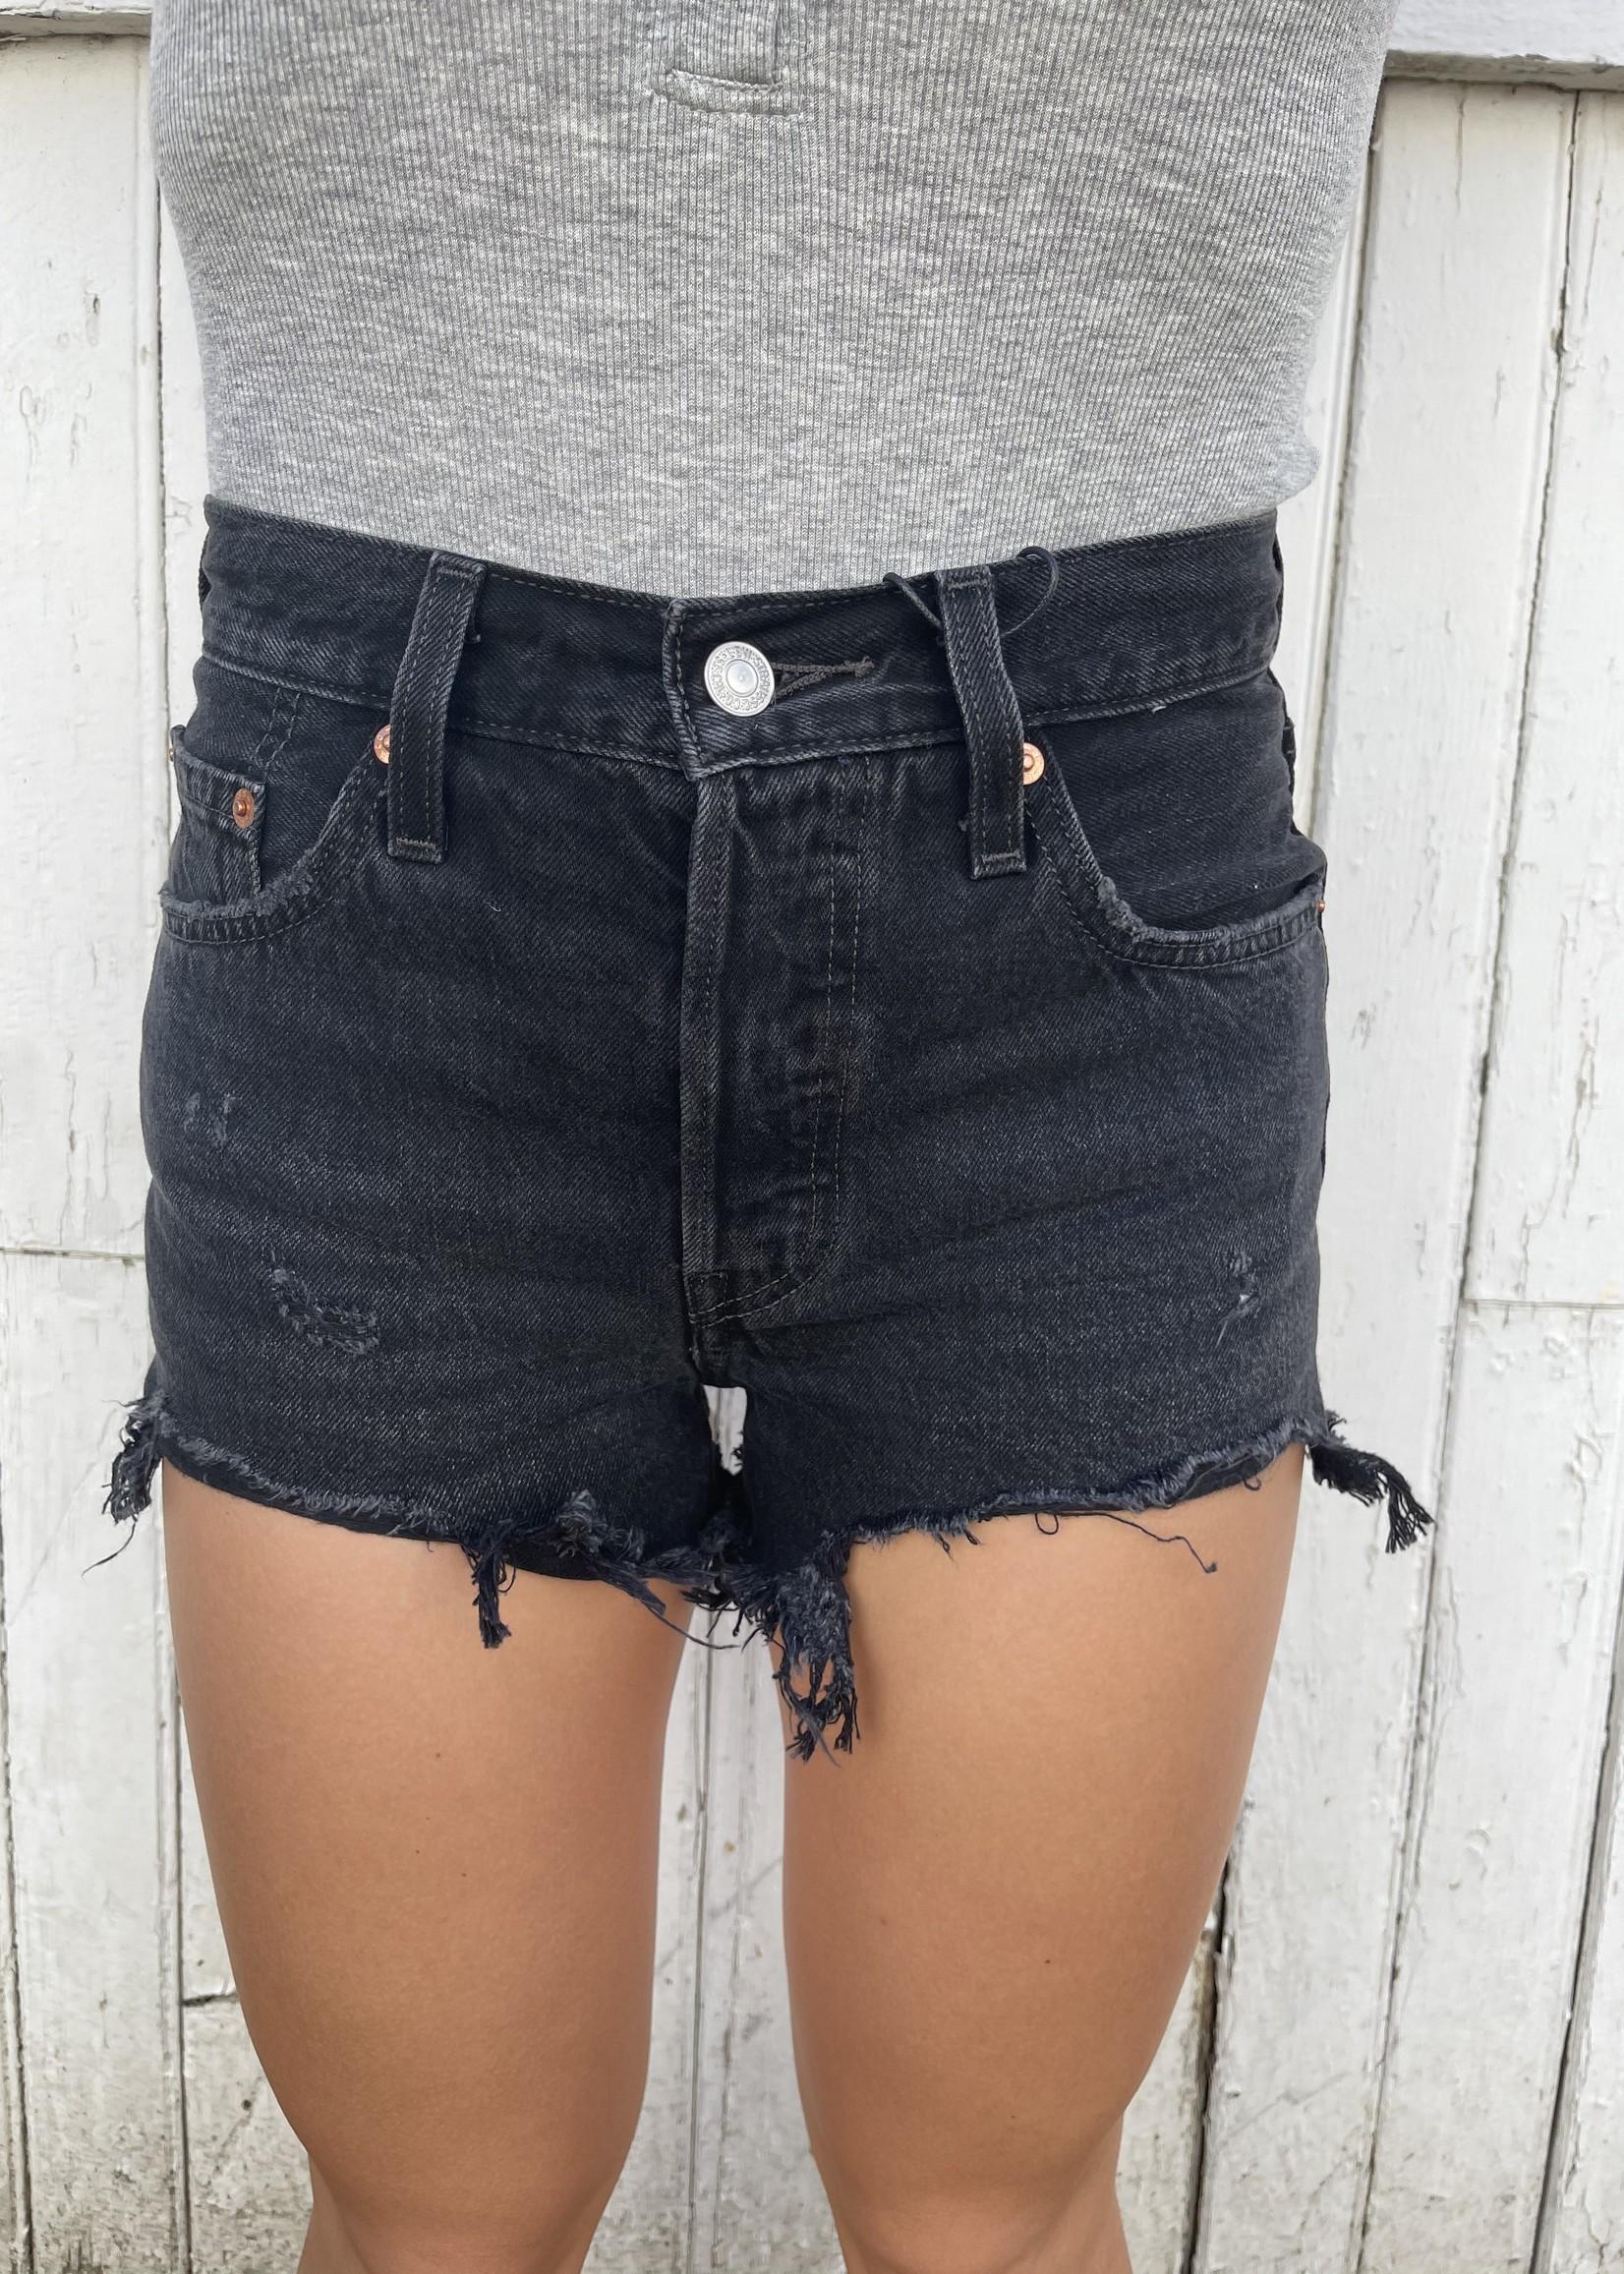 Levi's 501 hi rise cutoff shorts